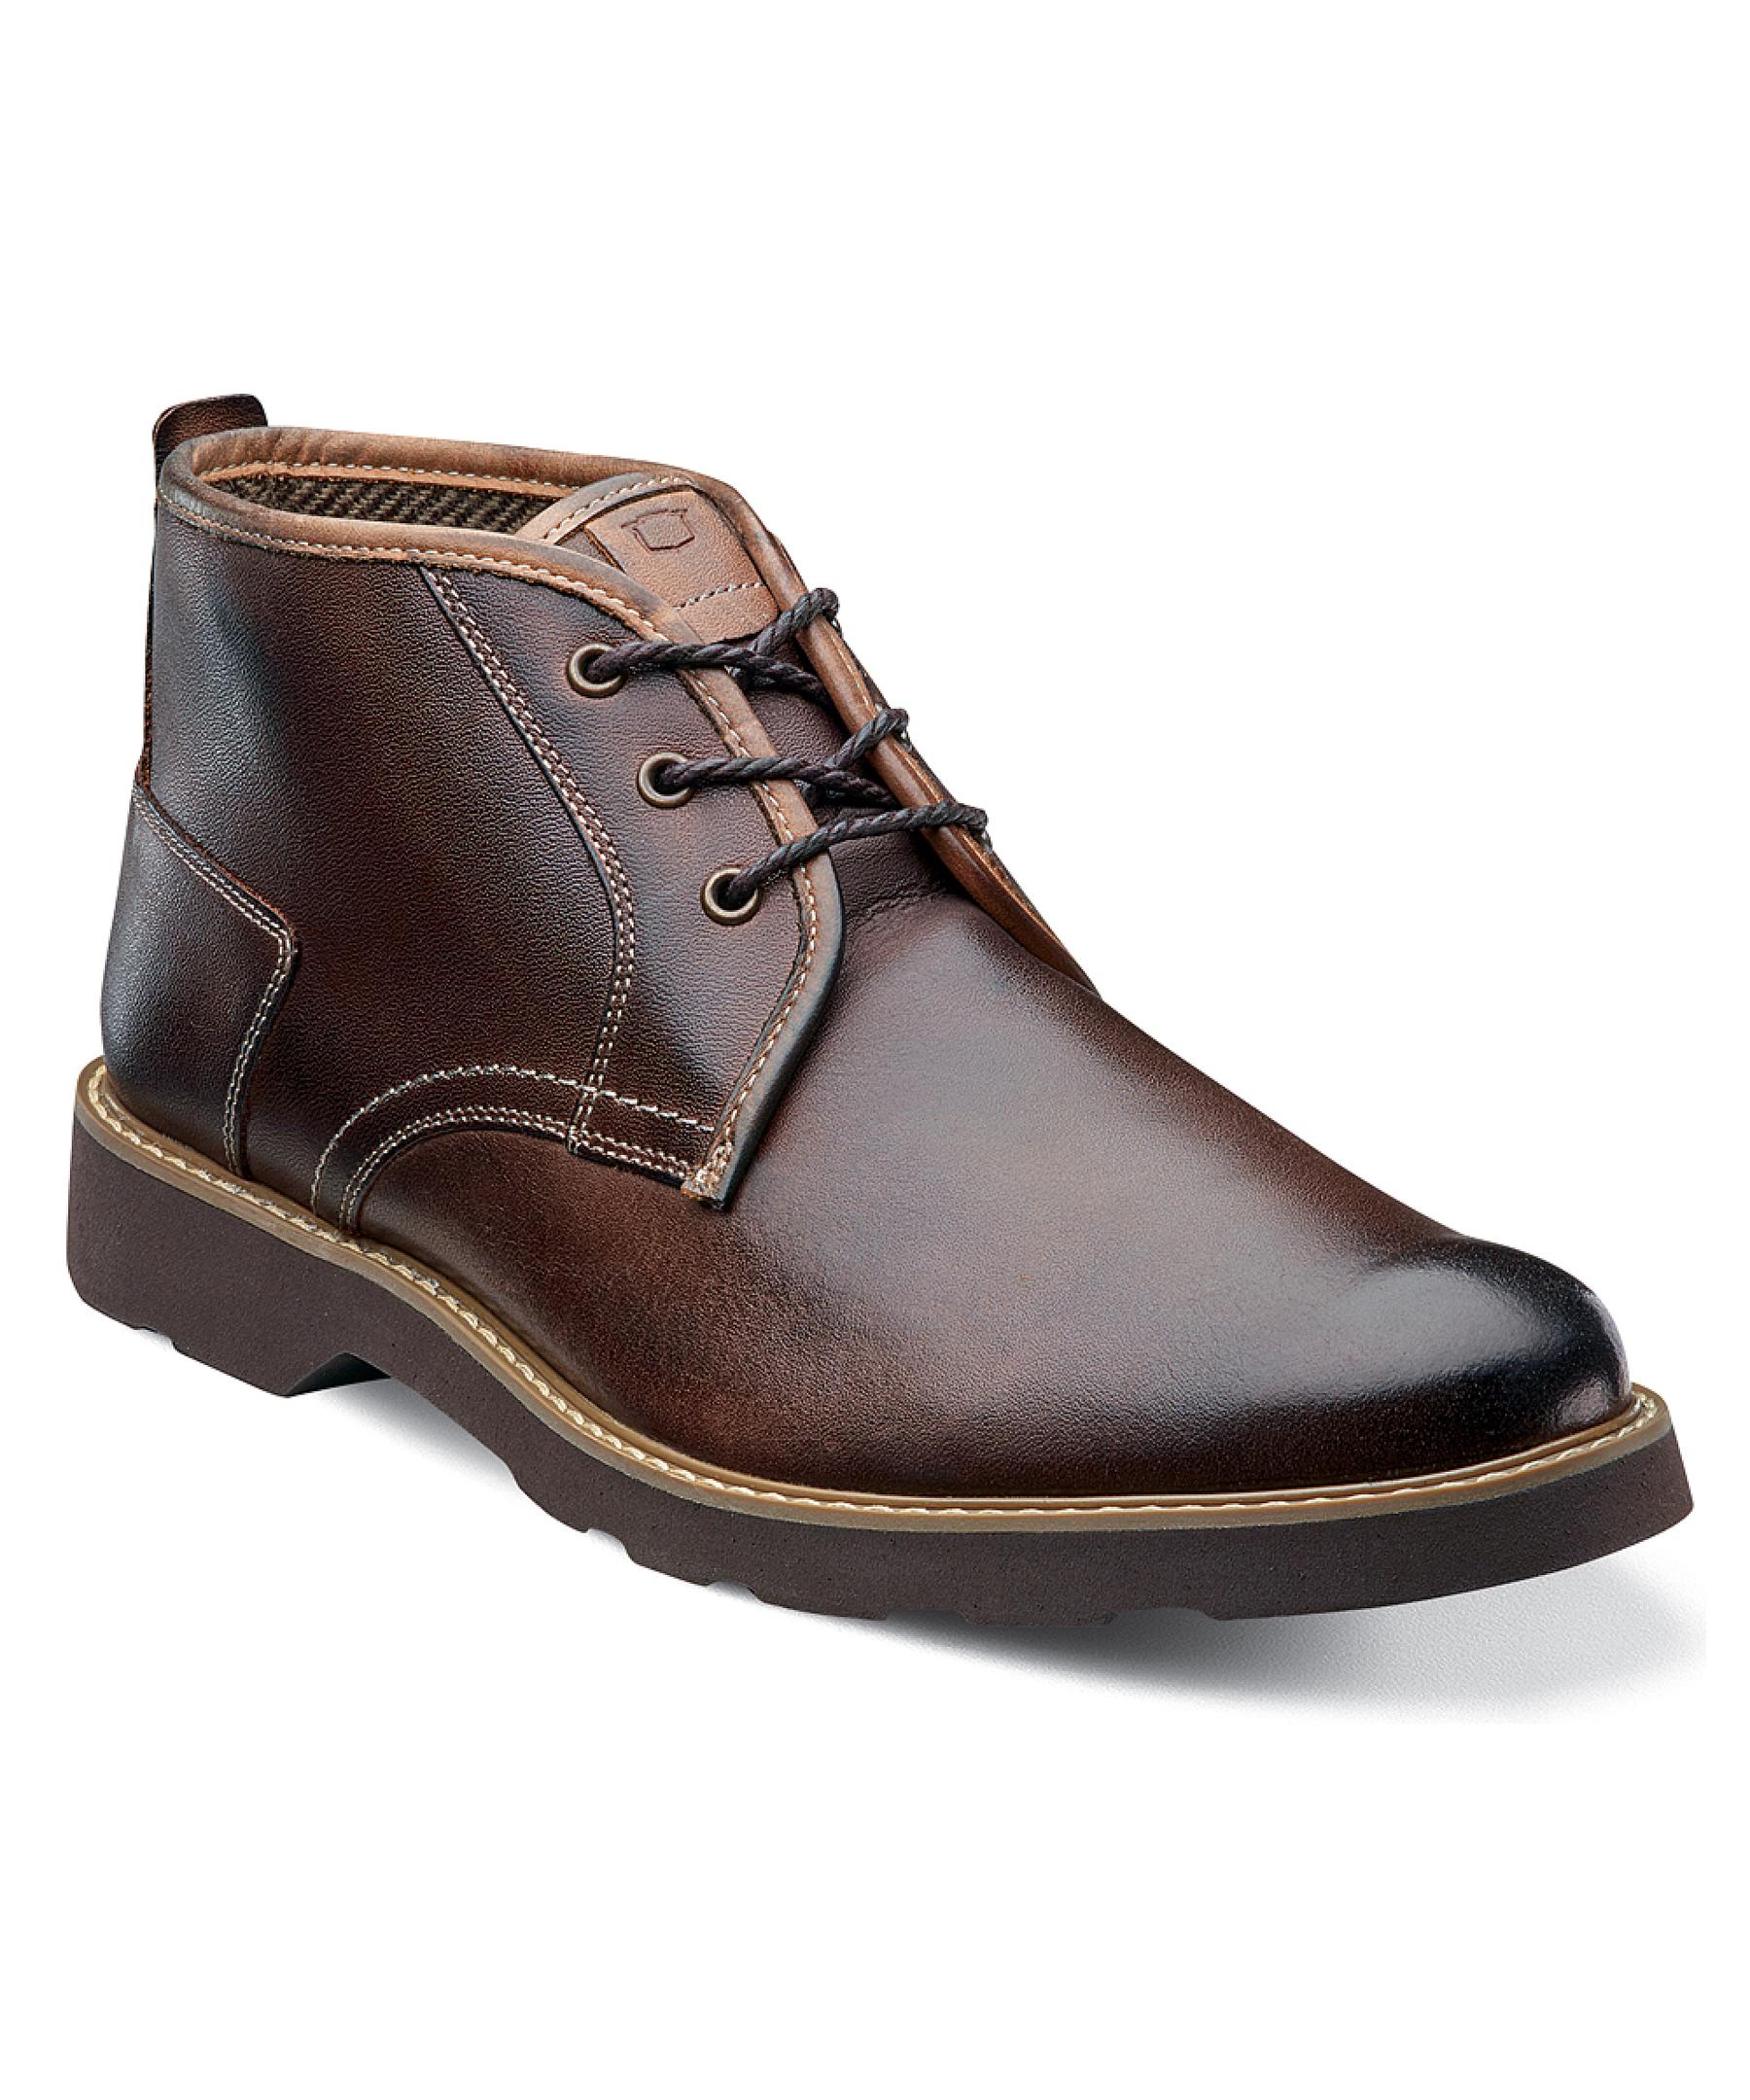 Florsheim Men S Casey Chukka Boot Boots In Brown For Men